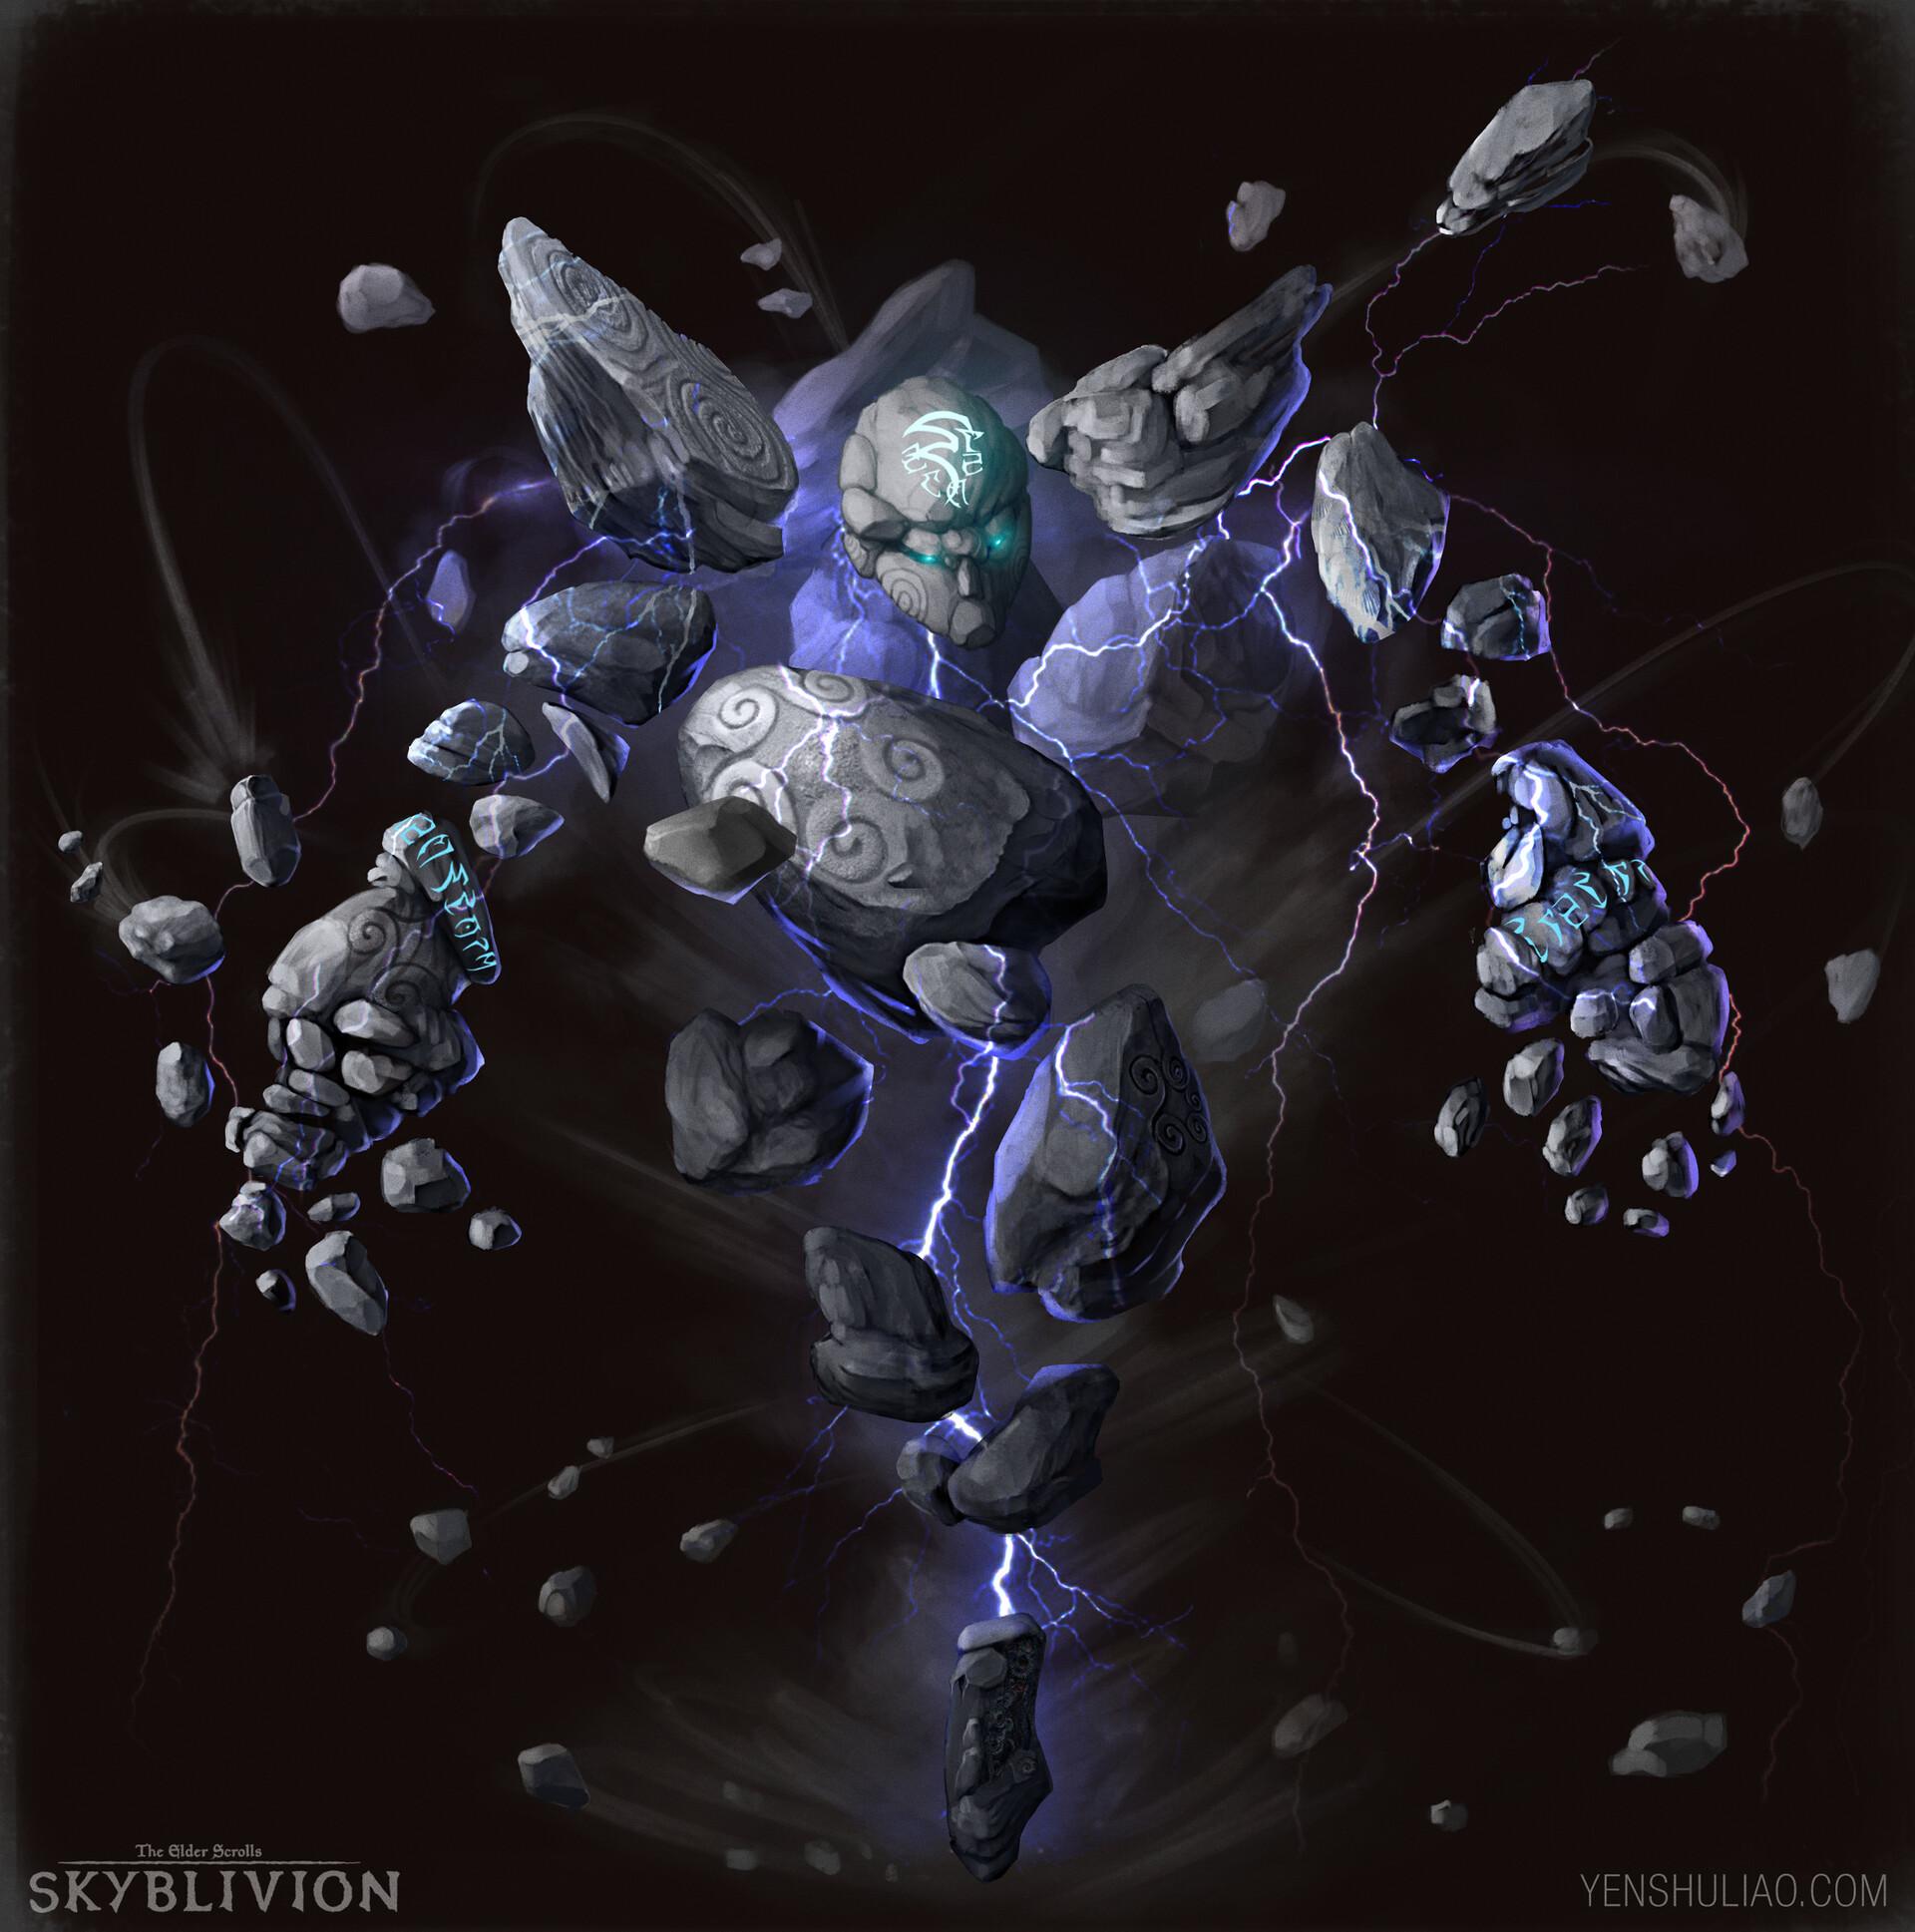 Image result for elder scrolls storm atronach art